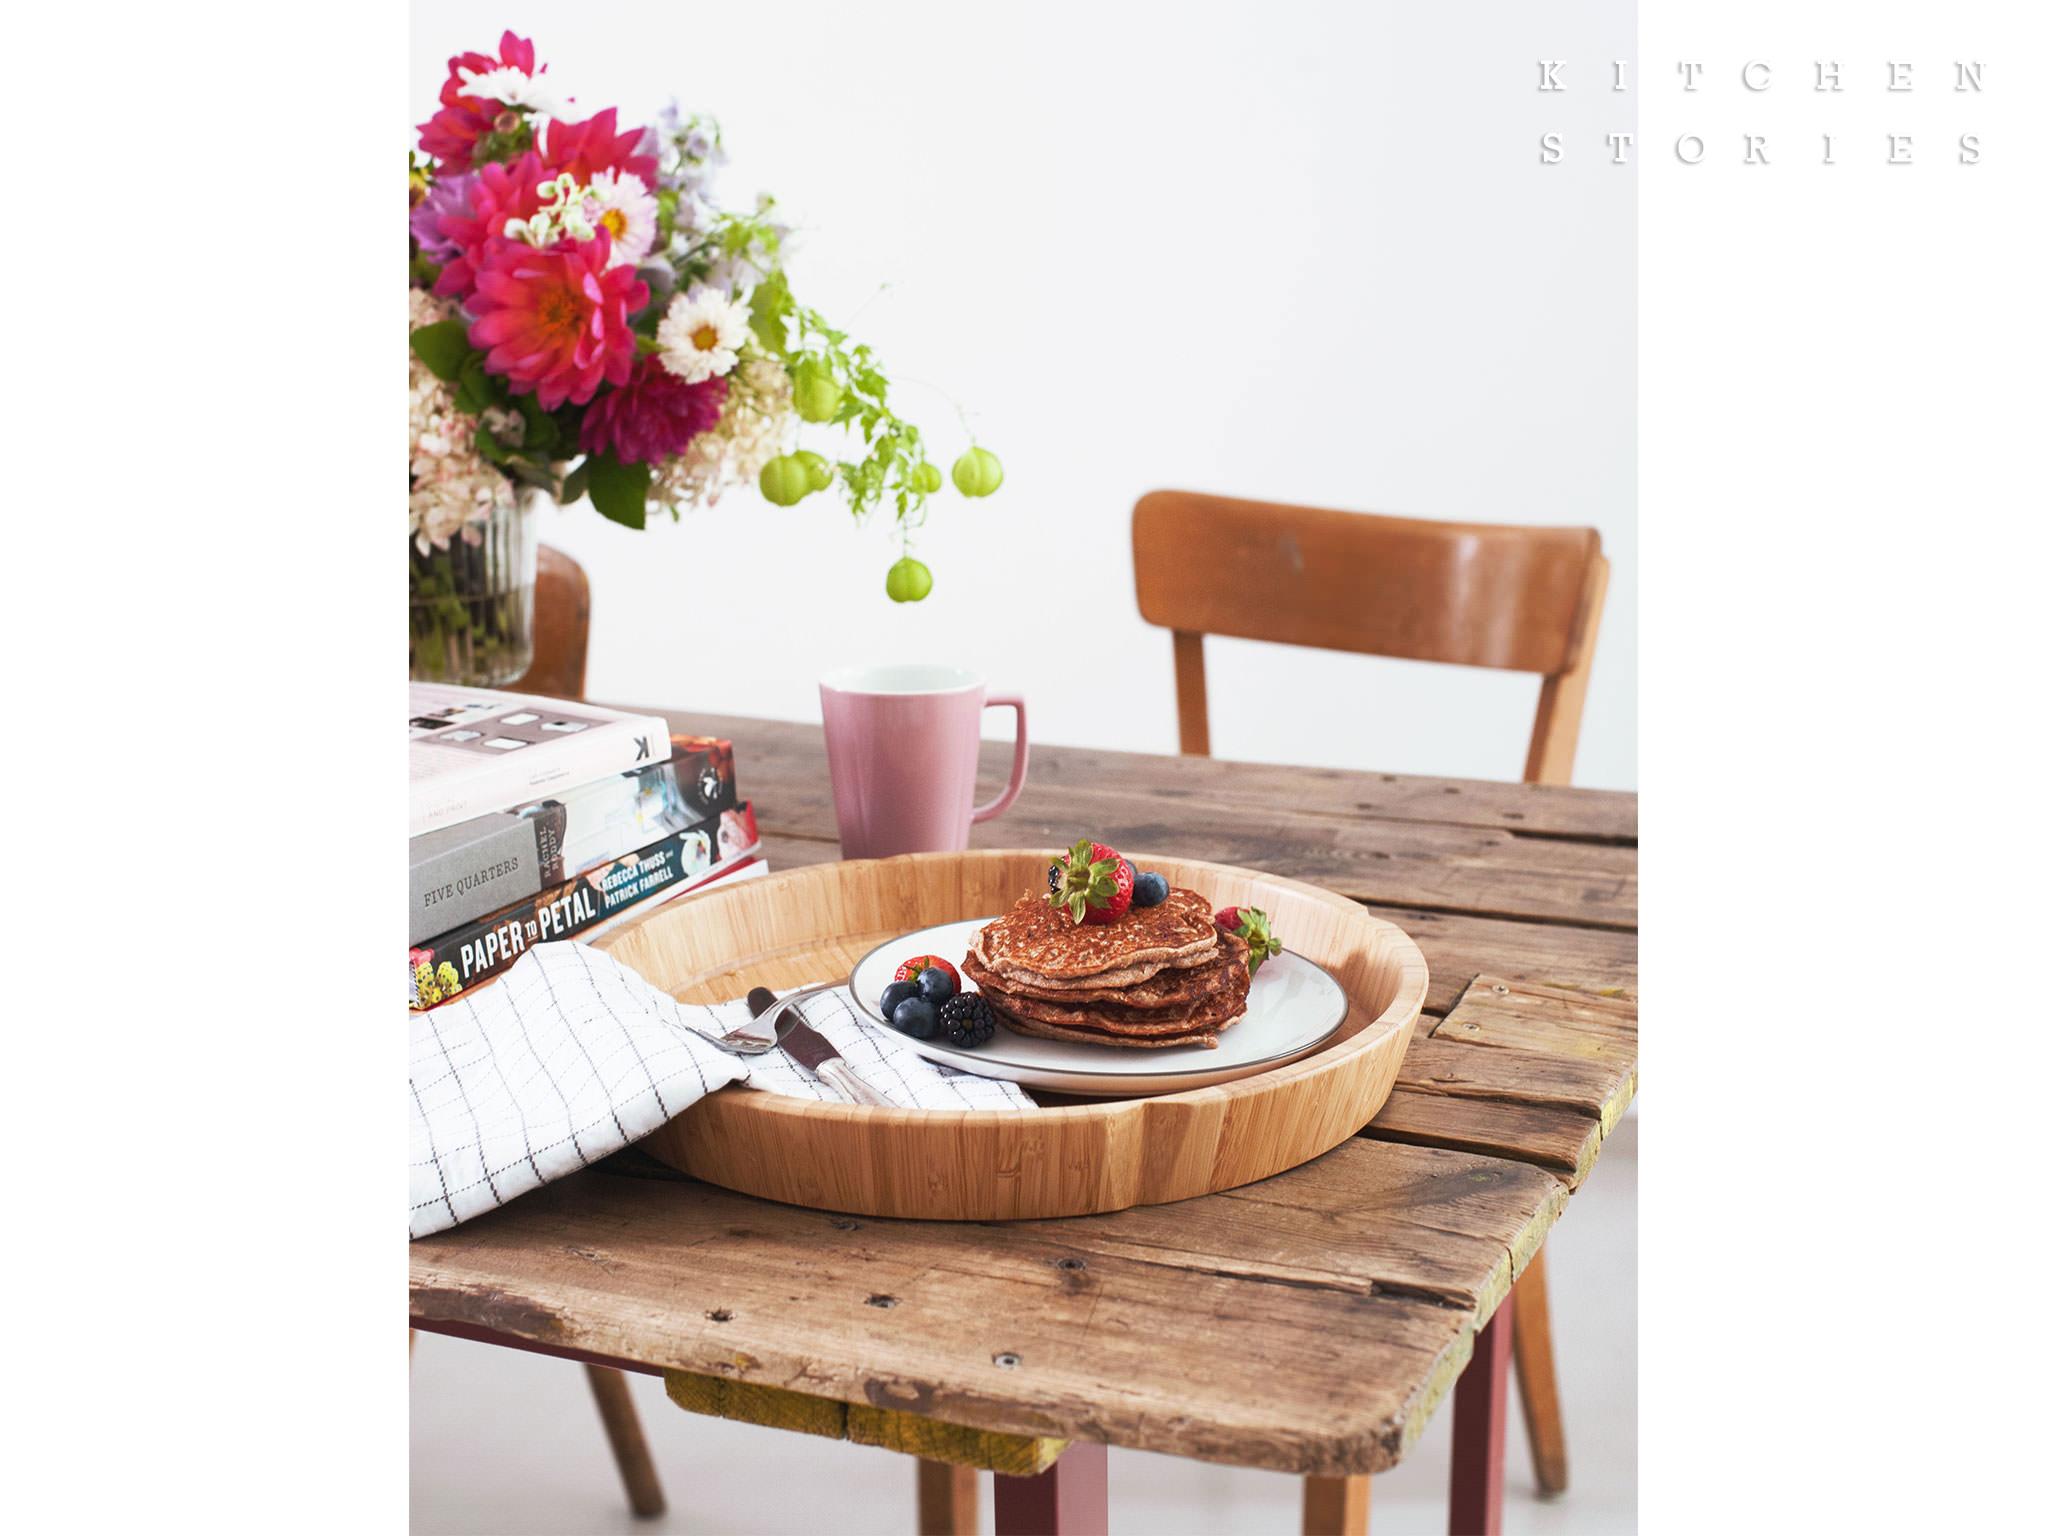 bea-la-panthere-fitness-lifestyle-blogger-blog-vegan-hamburg-muenchen-munich-germany-deutschland-eat-better-not-less-alpro-sistermag-kitchen-stories-fluffige-vegane-pancakes-2